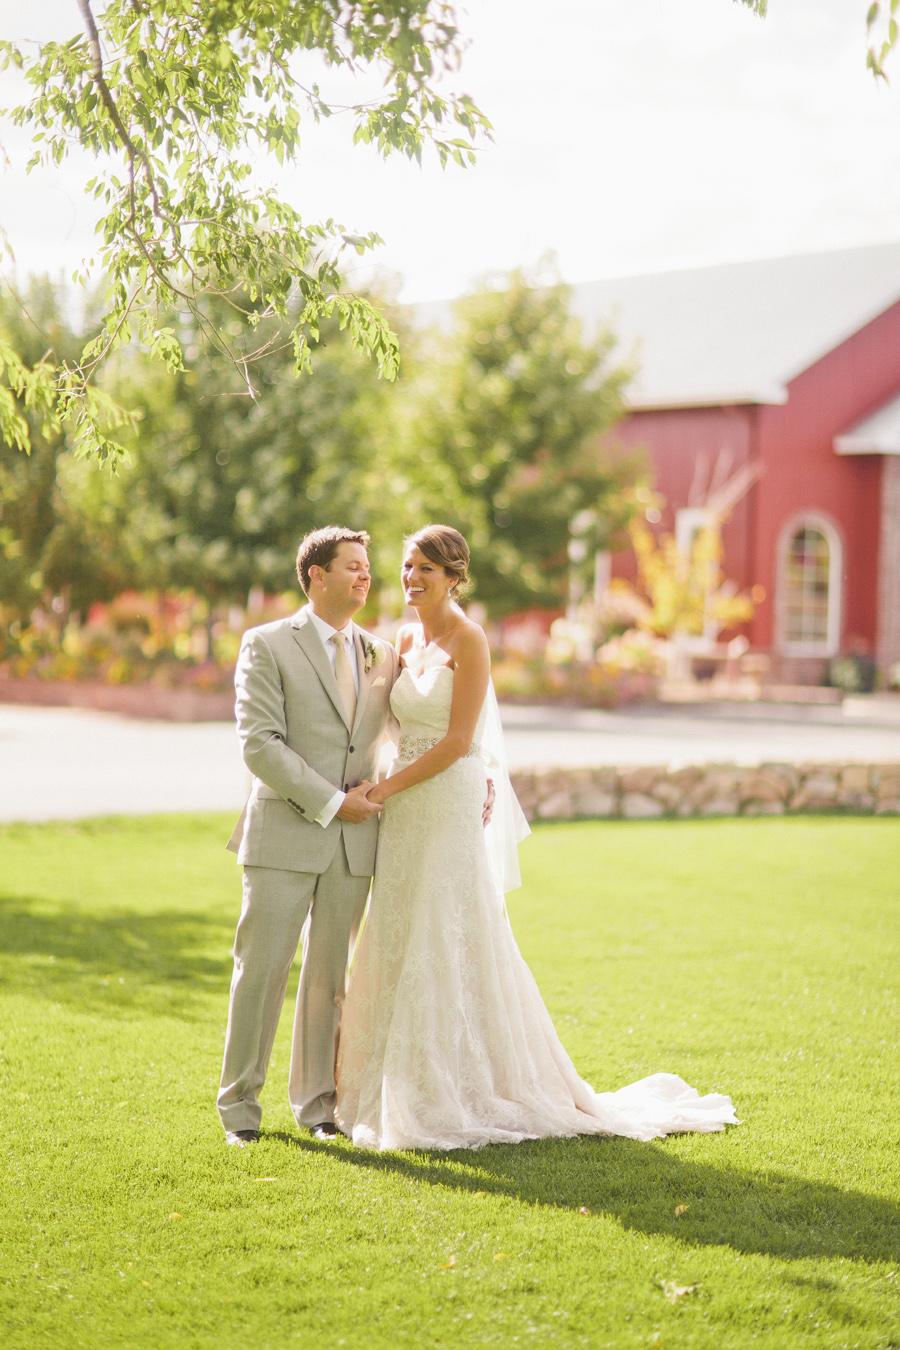 Emily_Todd_LarkspurColorado_Wedding_6.jpg